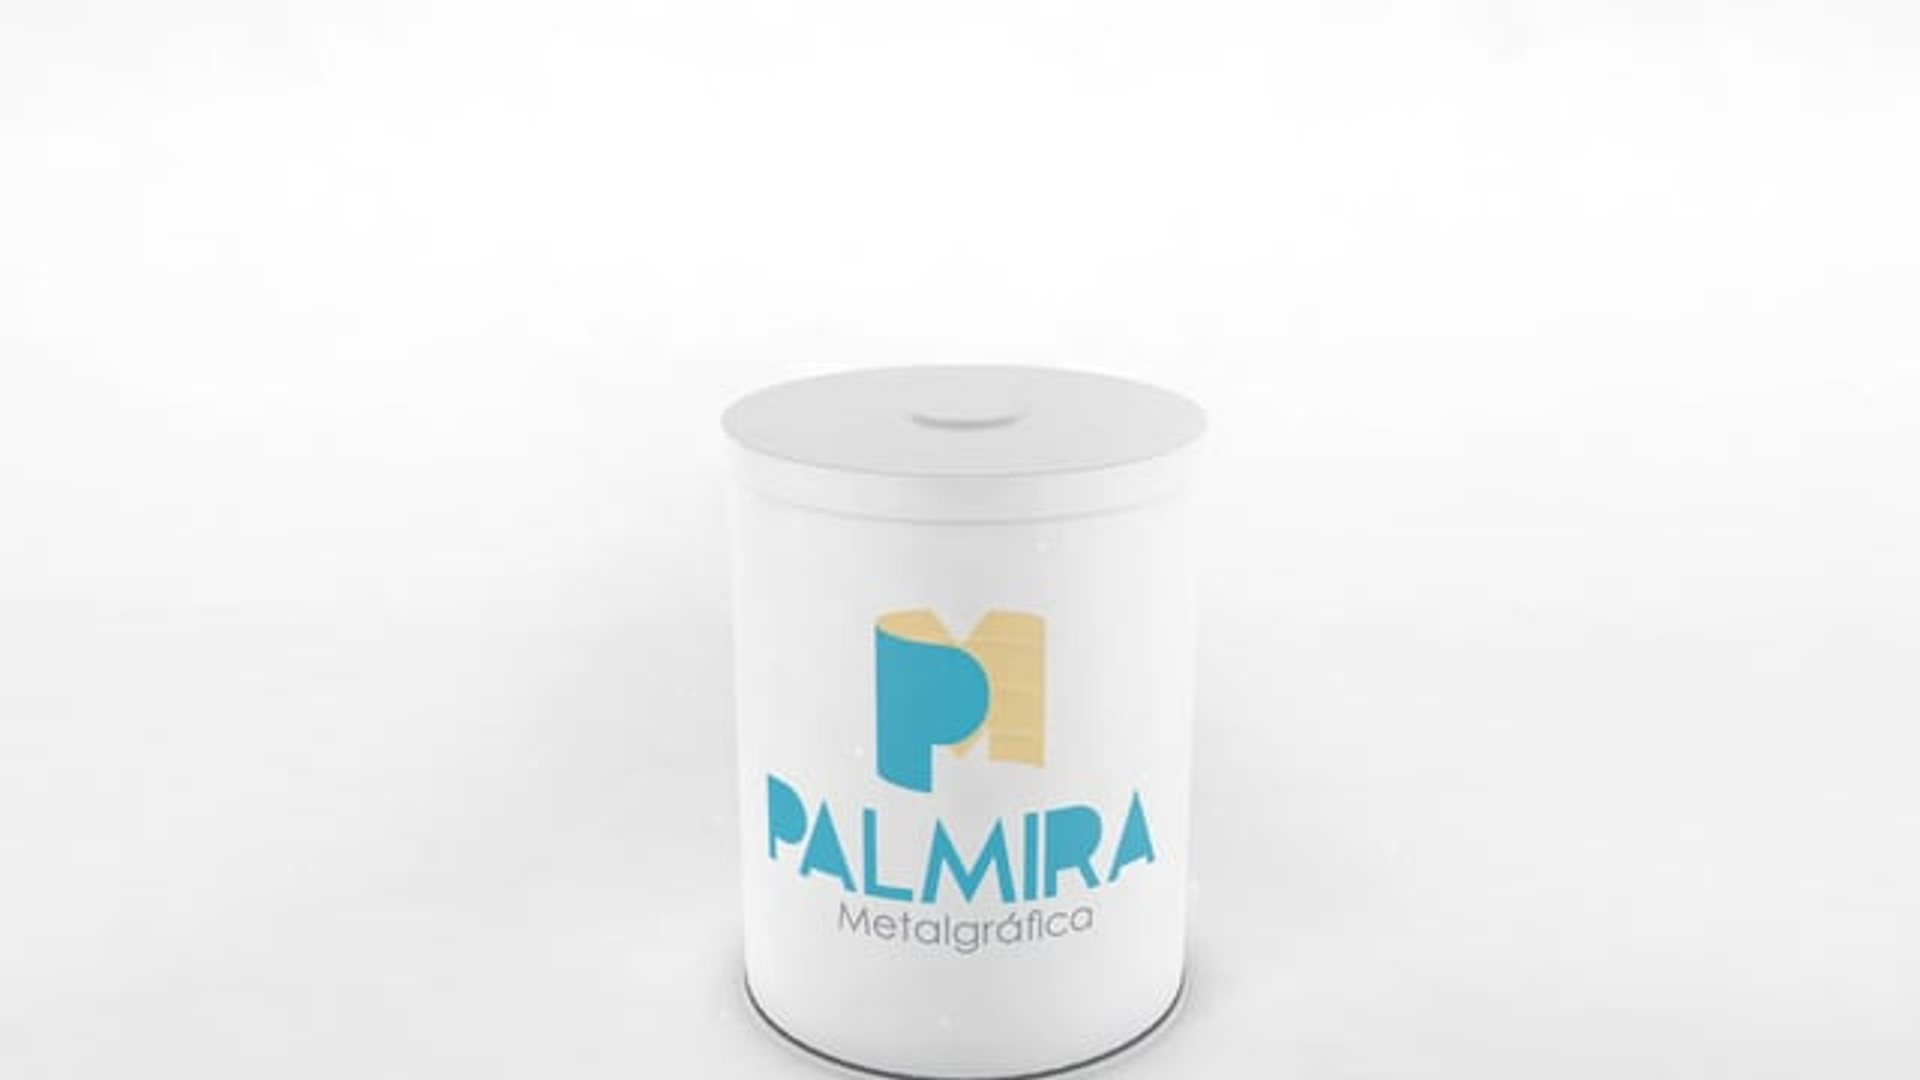 VT Palmira Metalgráfica